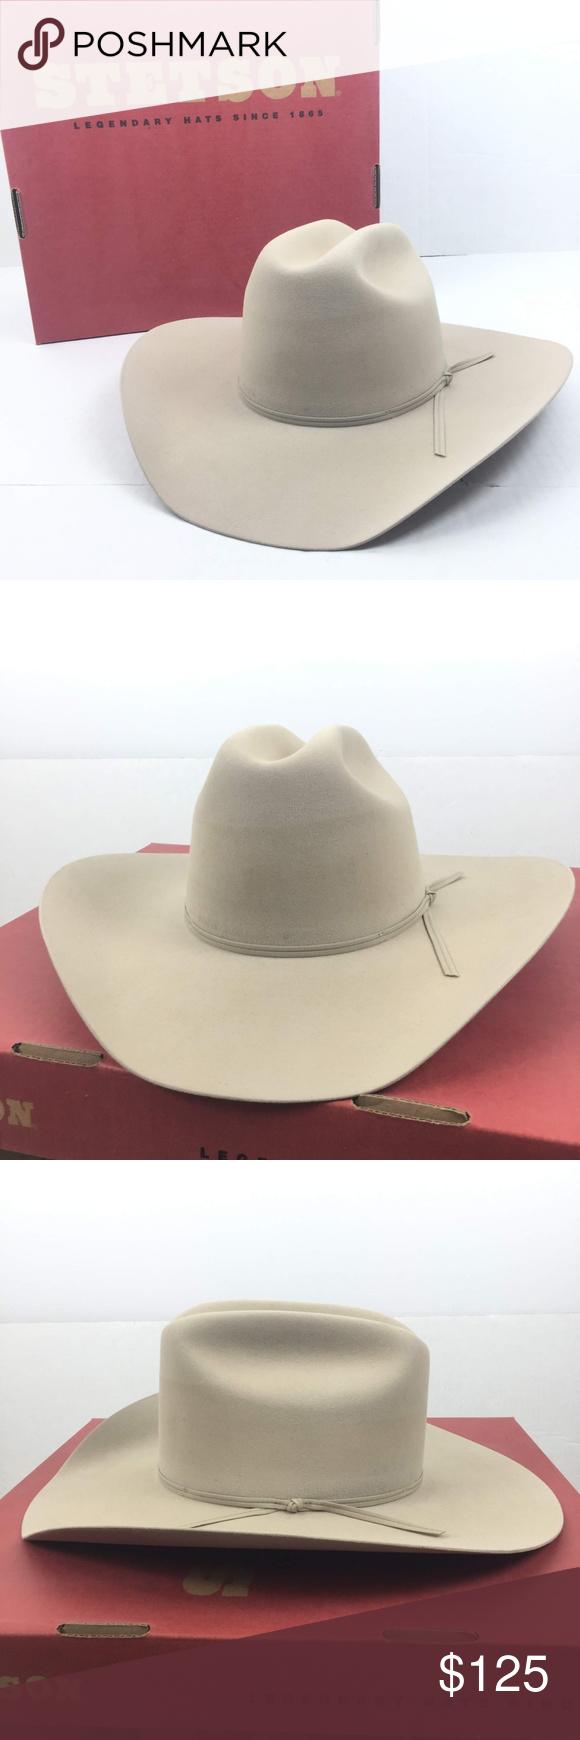 Stetson Size 7 1 8 Roper Special Cowboy Hat Cowboy Hats Stetson Cowboy